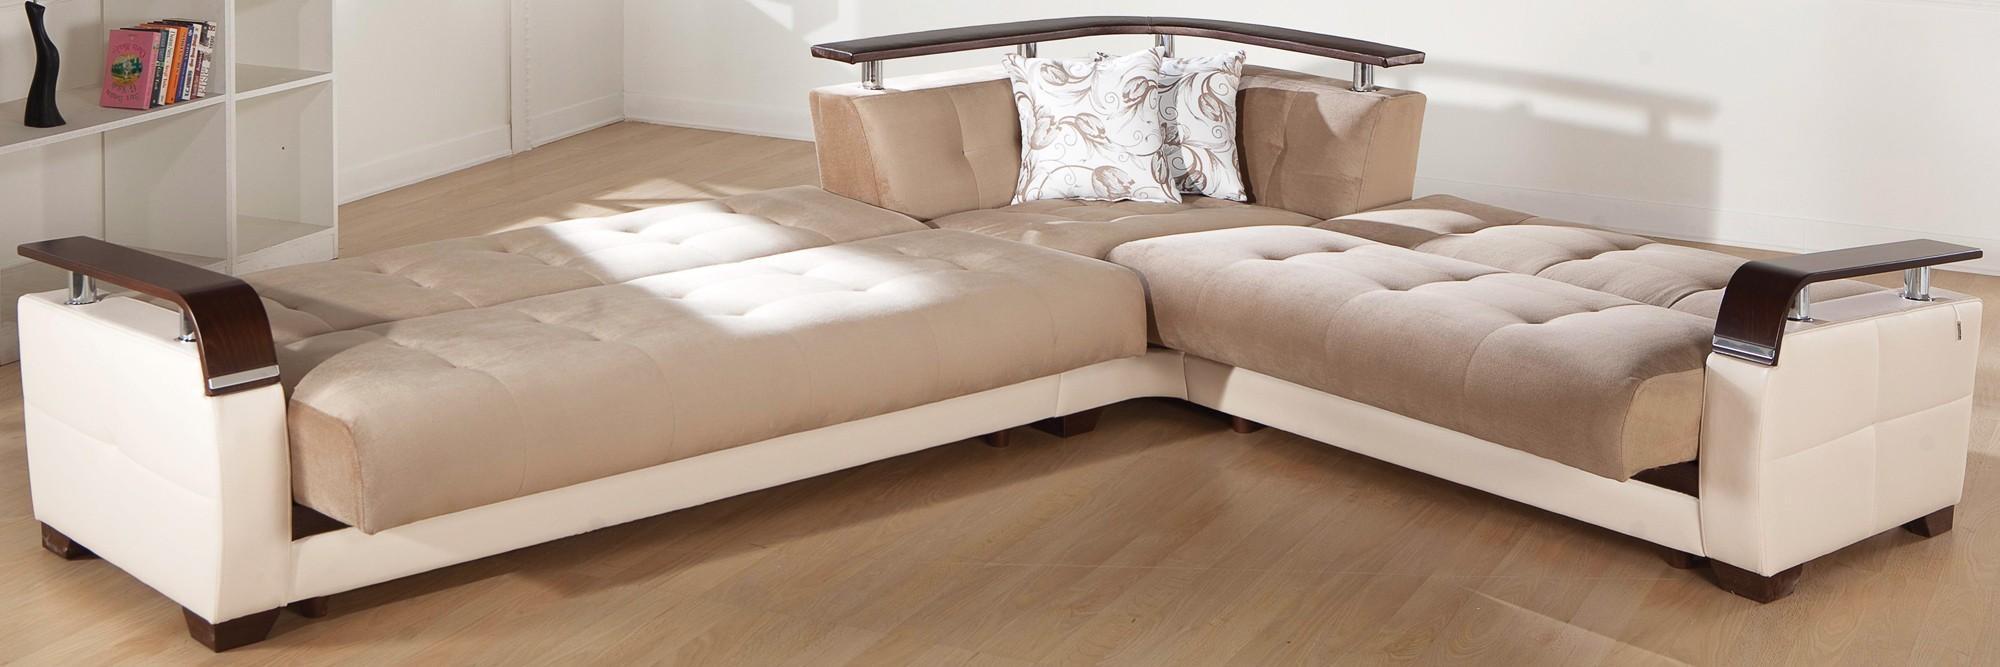 Sofas Center : Imposing Sofaper Sectional Images Inspirations Best Regarding Houston Sectional Sofa (Image 13 of 20)